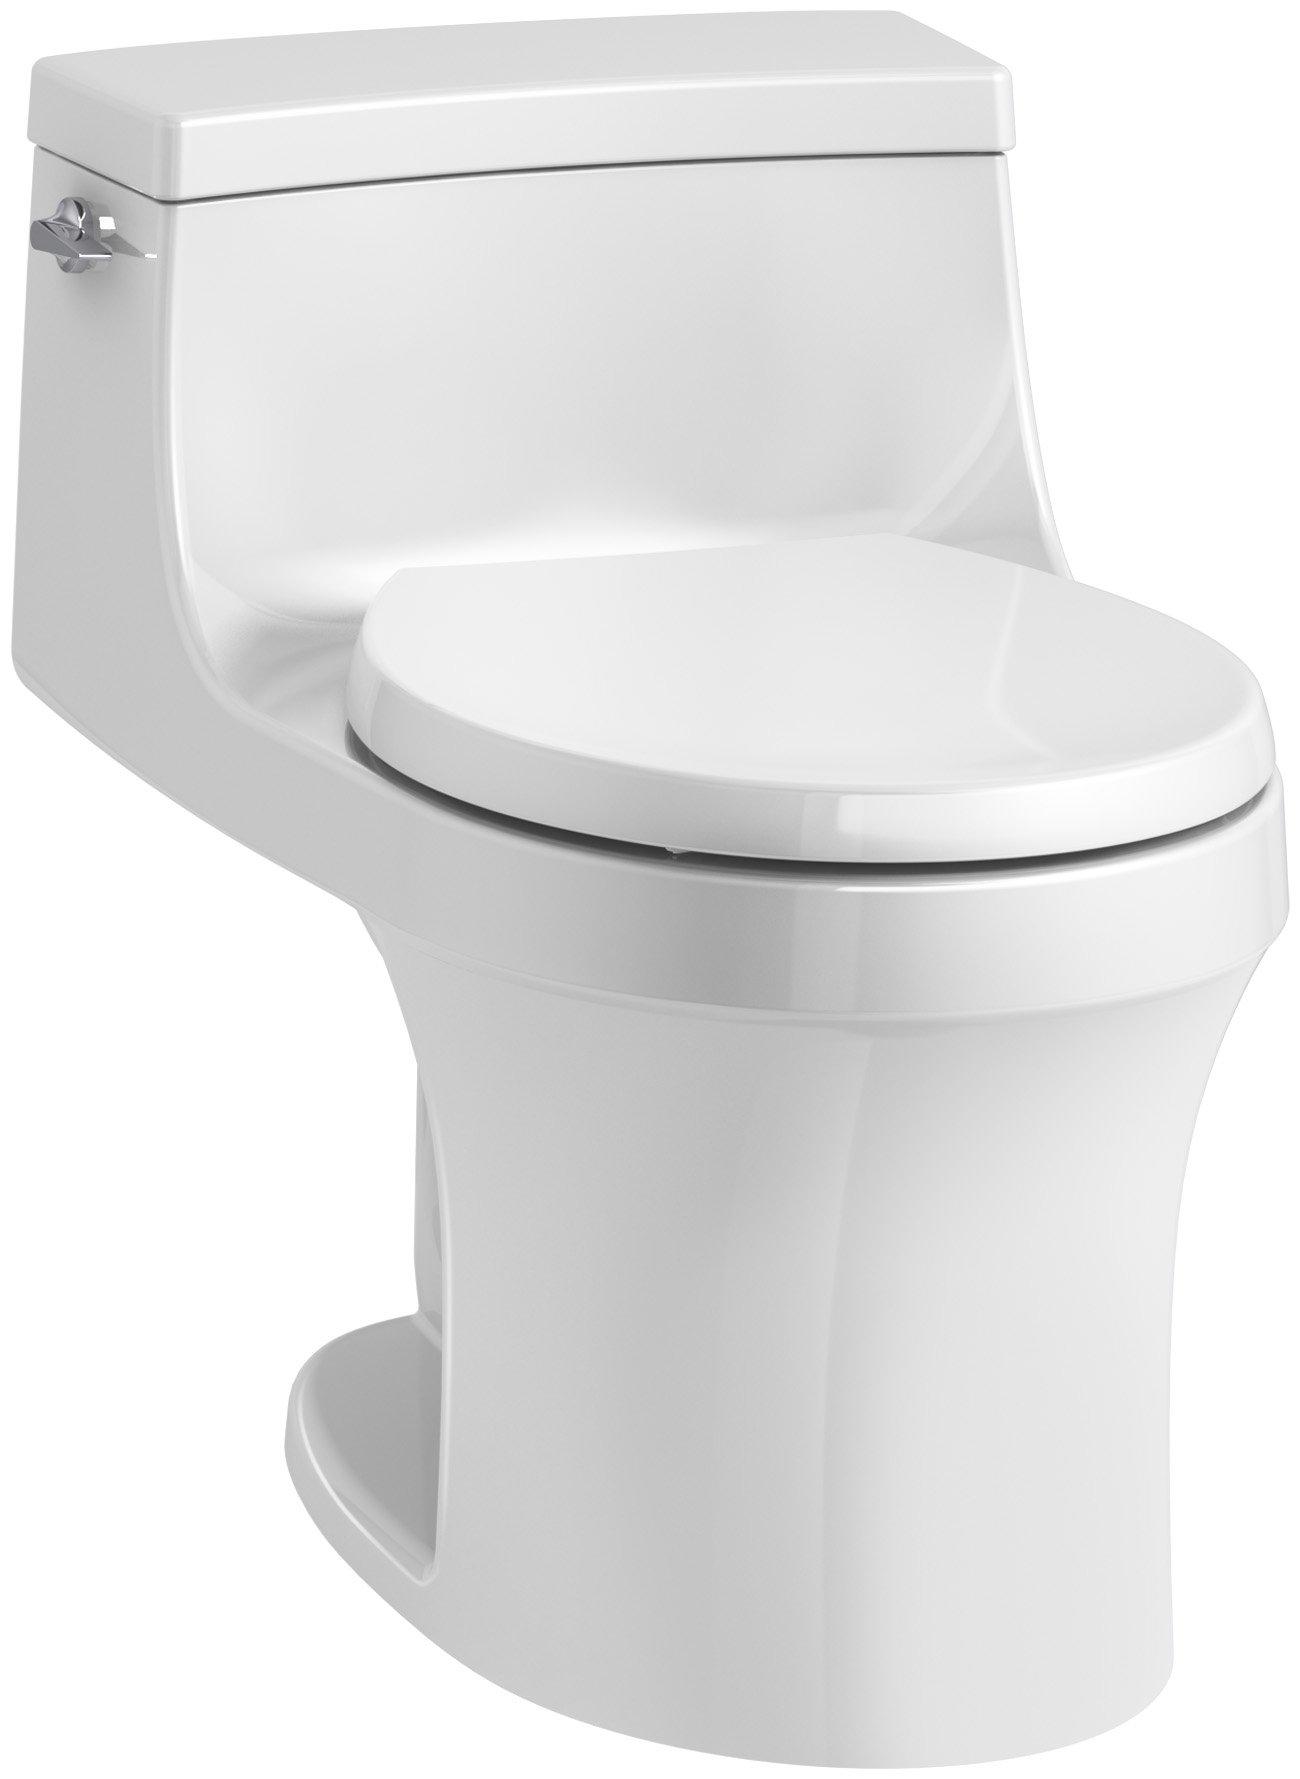 KOHLER K-4007-0 San Souci Toilet, 24.25 x 16.75 x 25.63 inches, White by Kohler